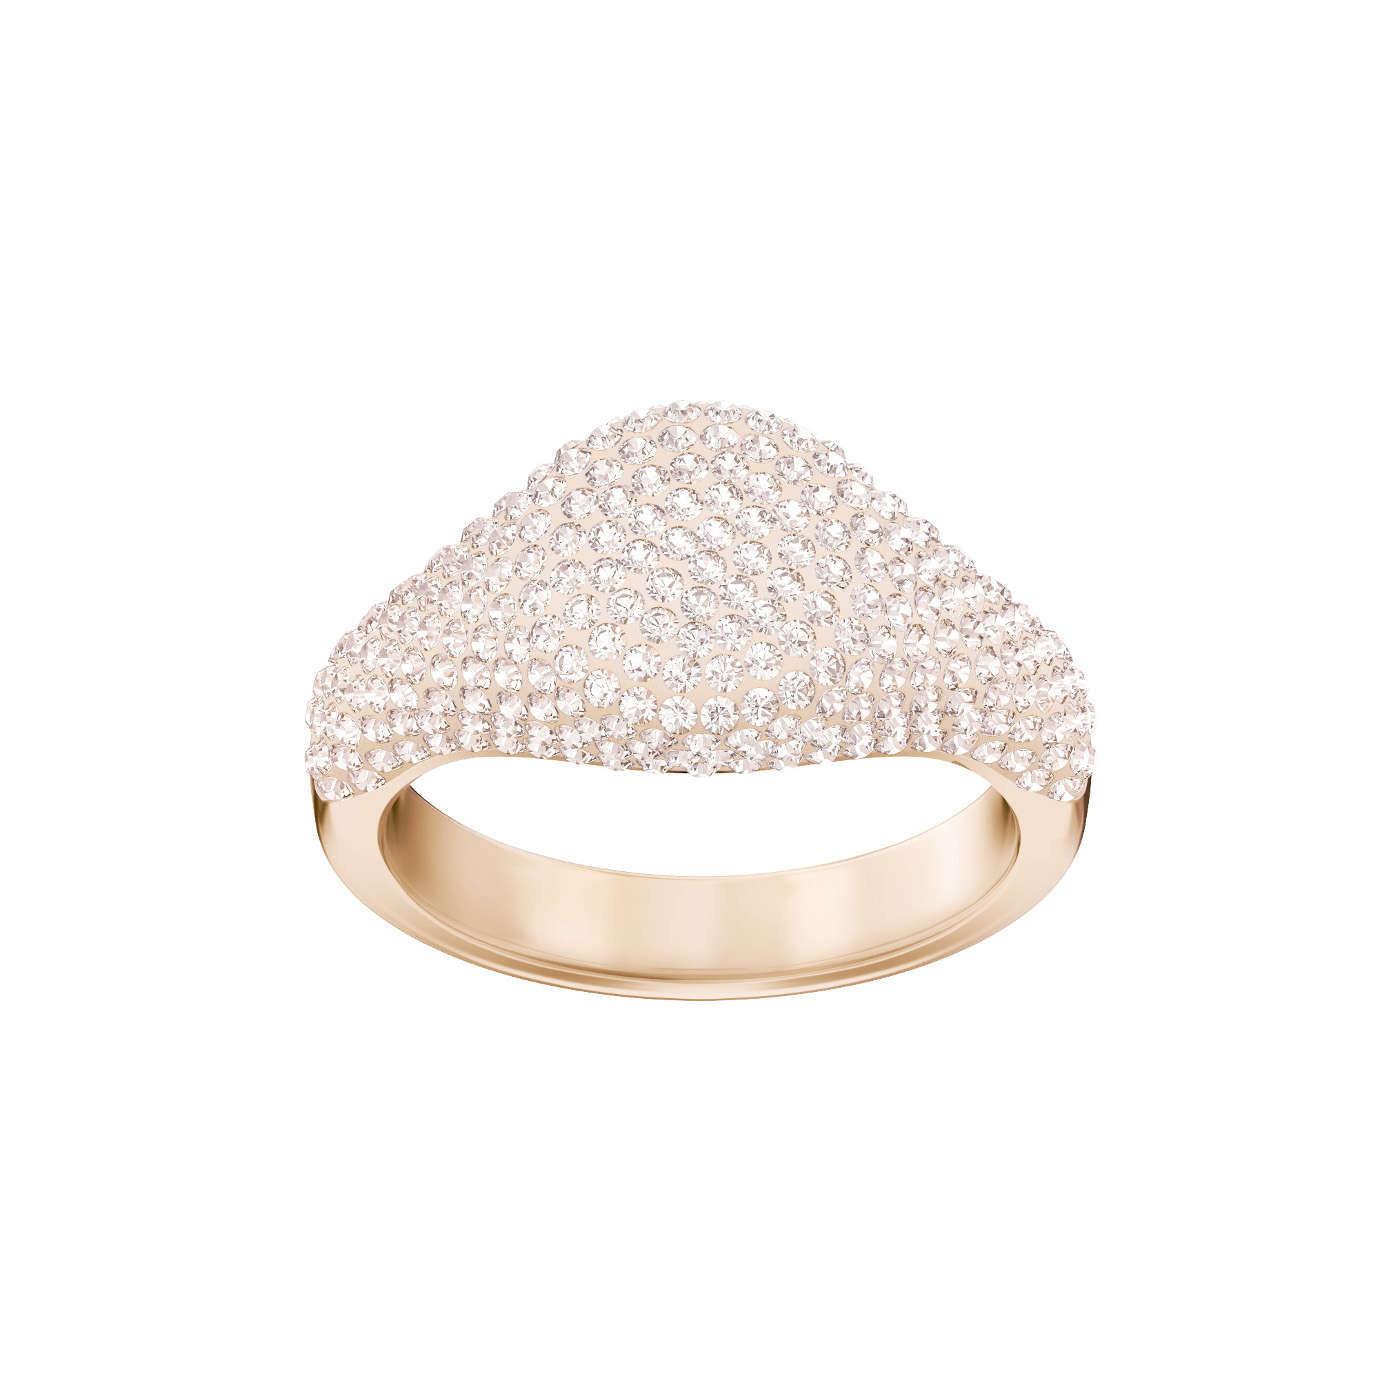 Swarovski bague Stone-signet-silk - Bijoux 3f169079a714